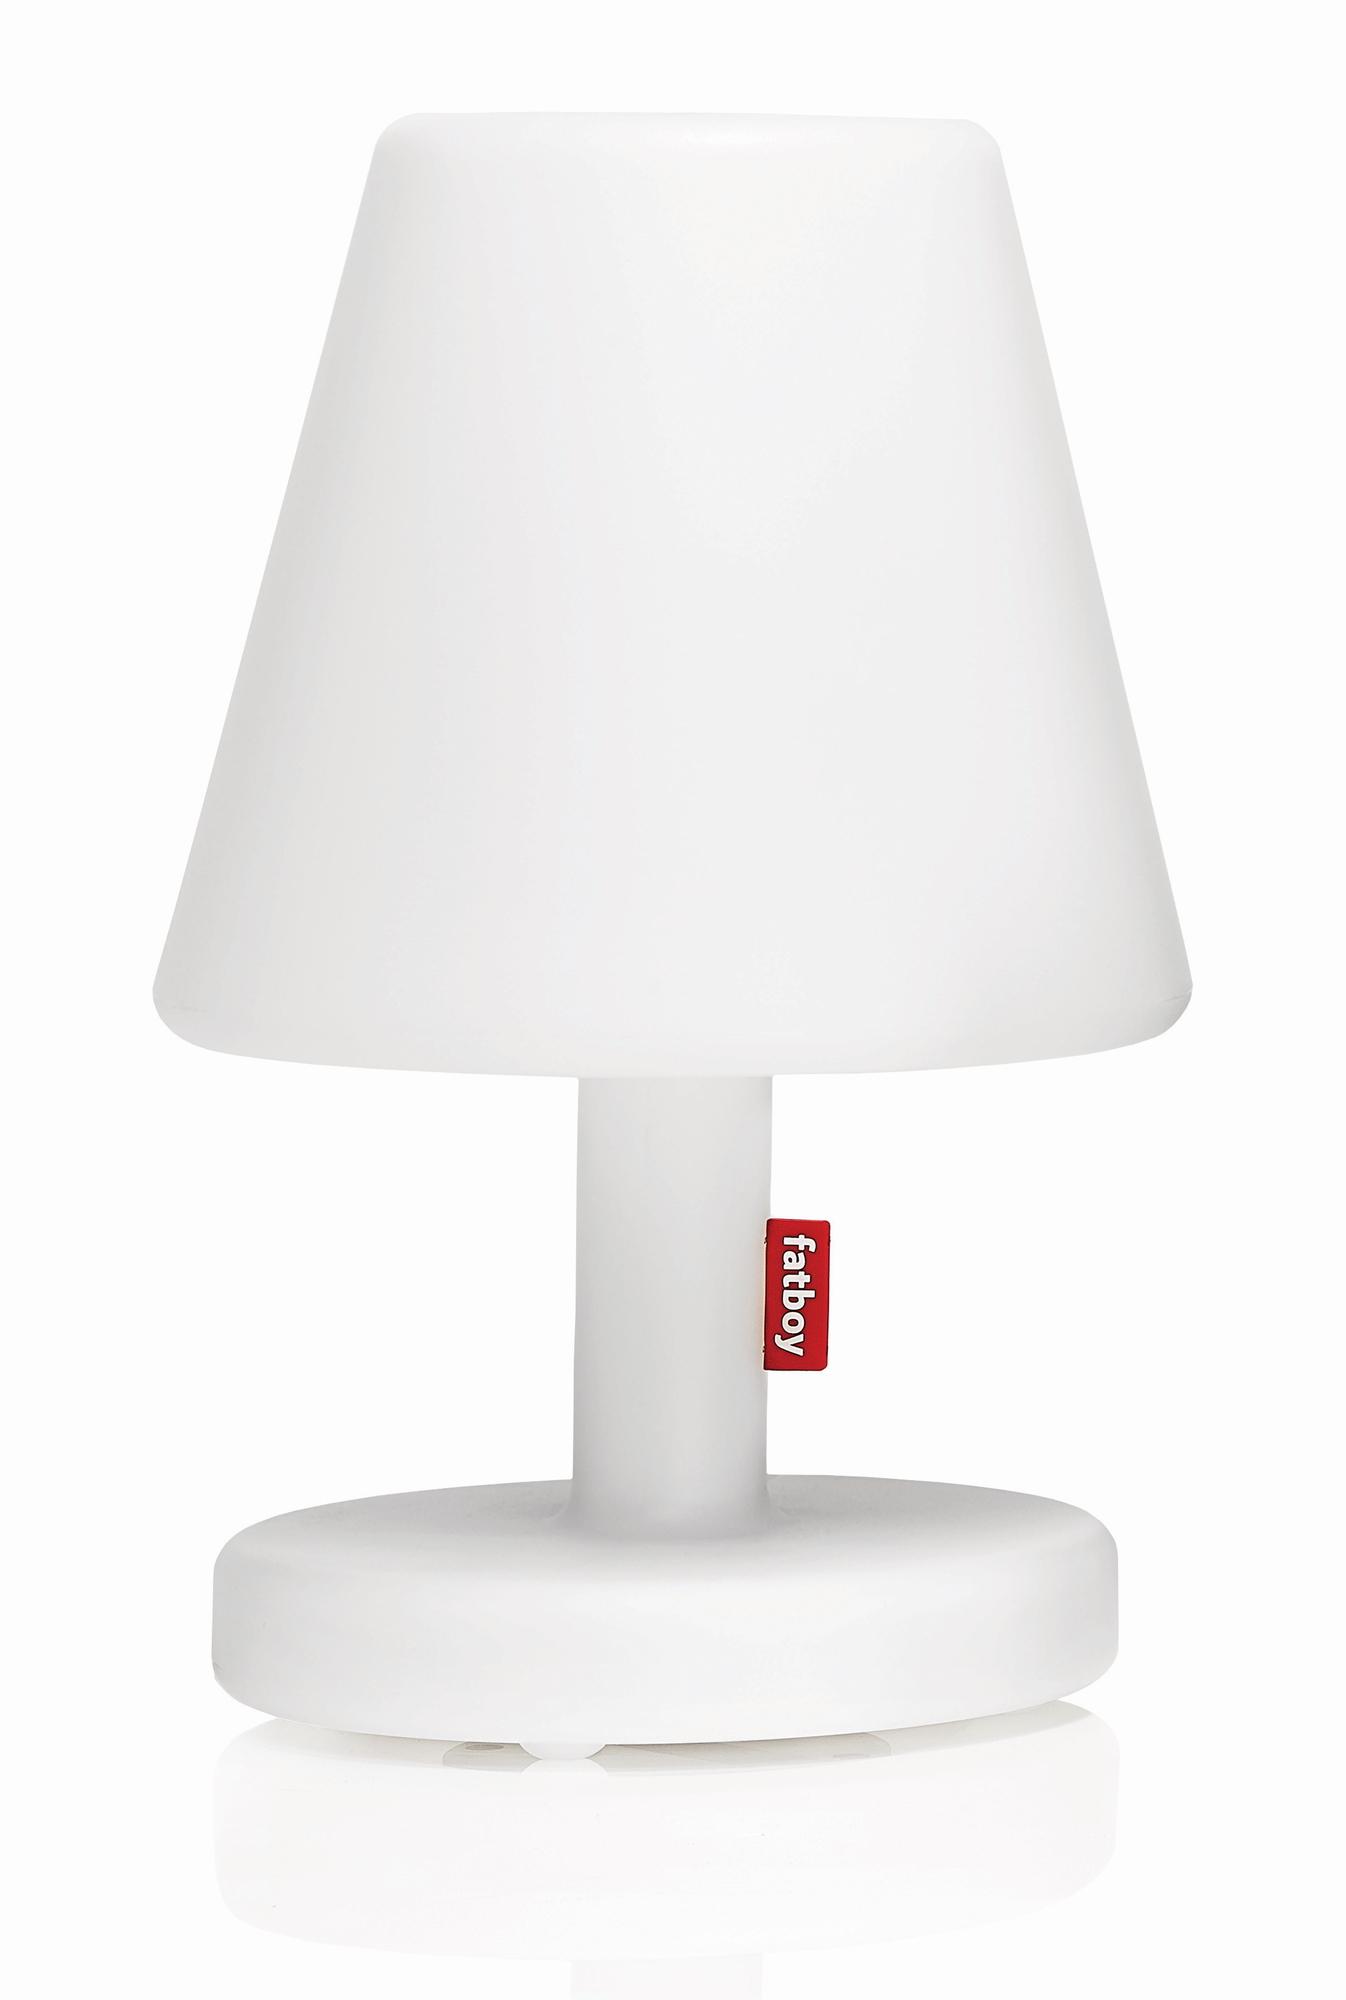 Edison the Medium Outdoor Lamp Fatboy